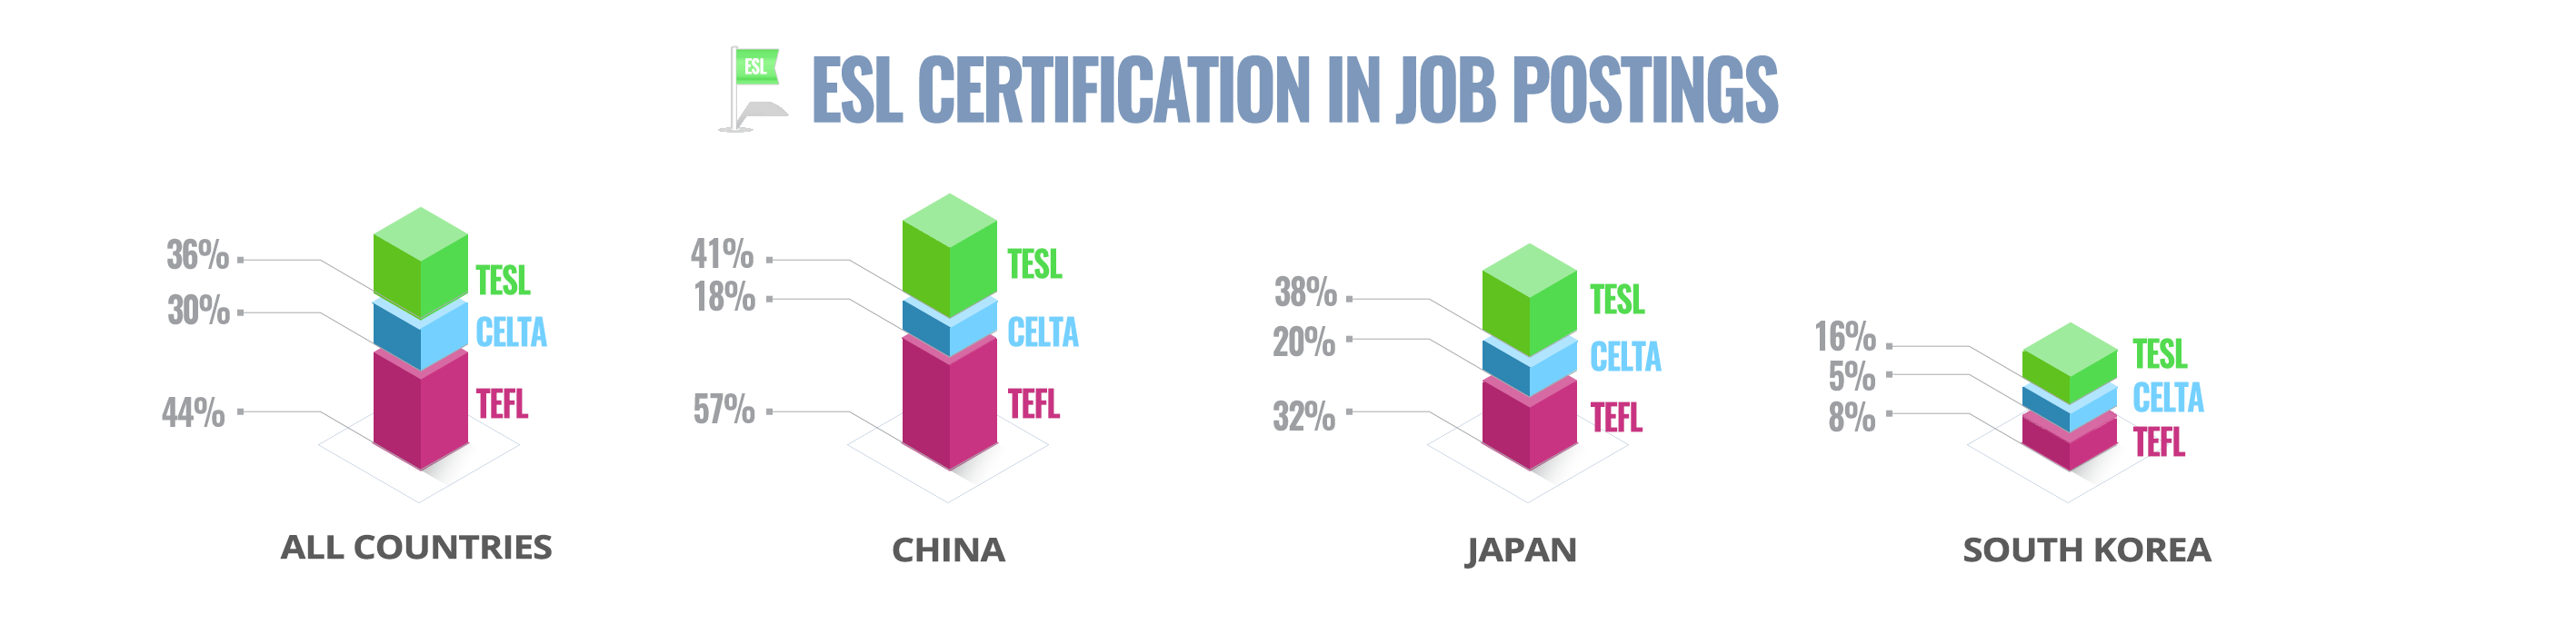 ESL Certification Types